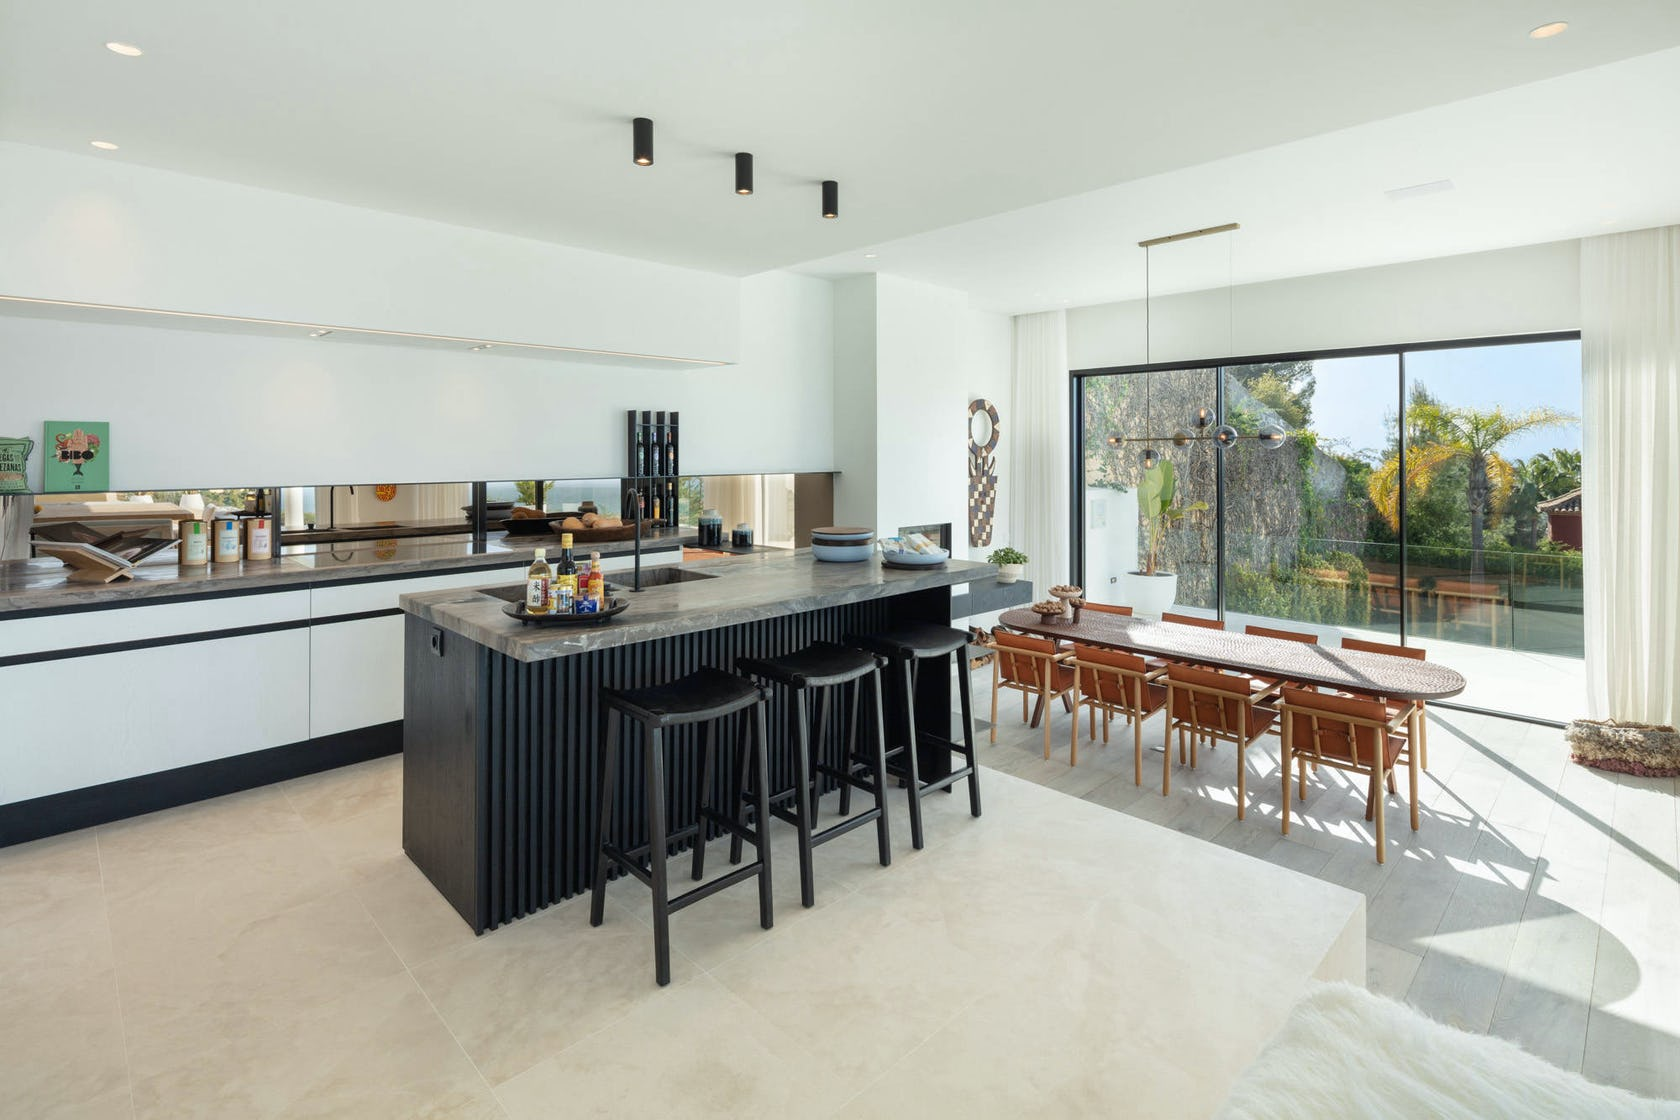 indoors room furniture interior design housing building chair kitchen island